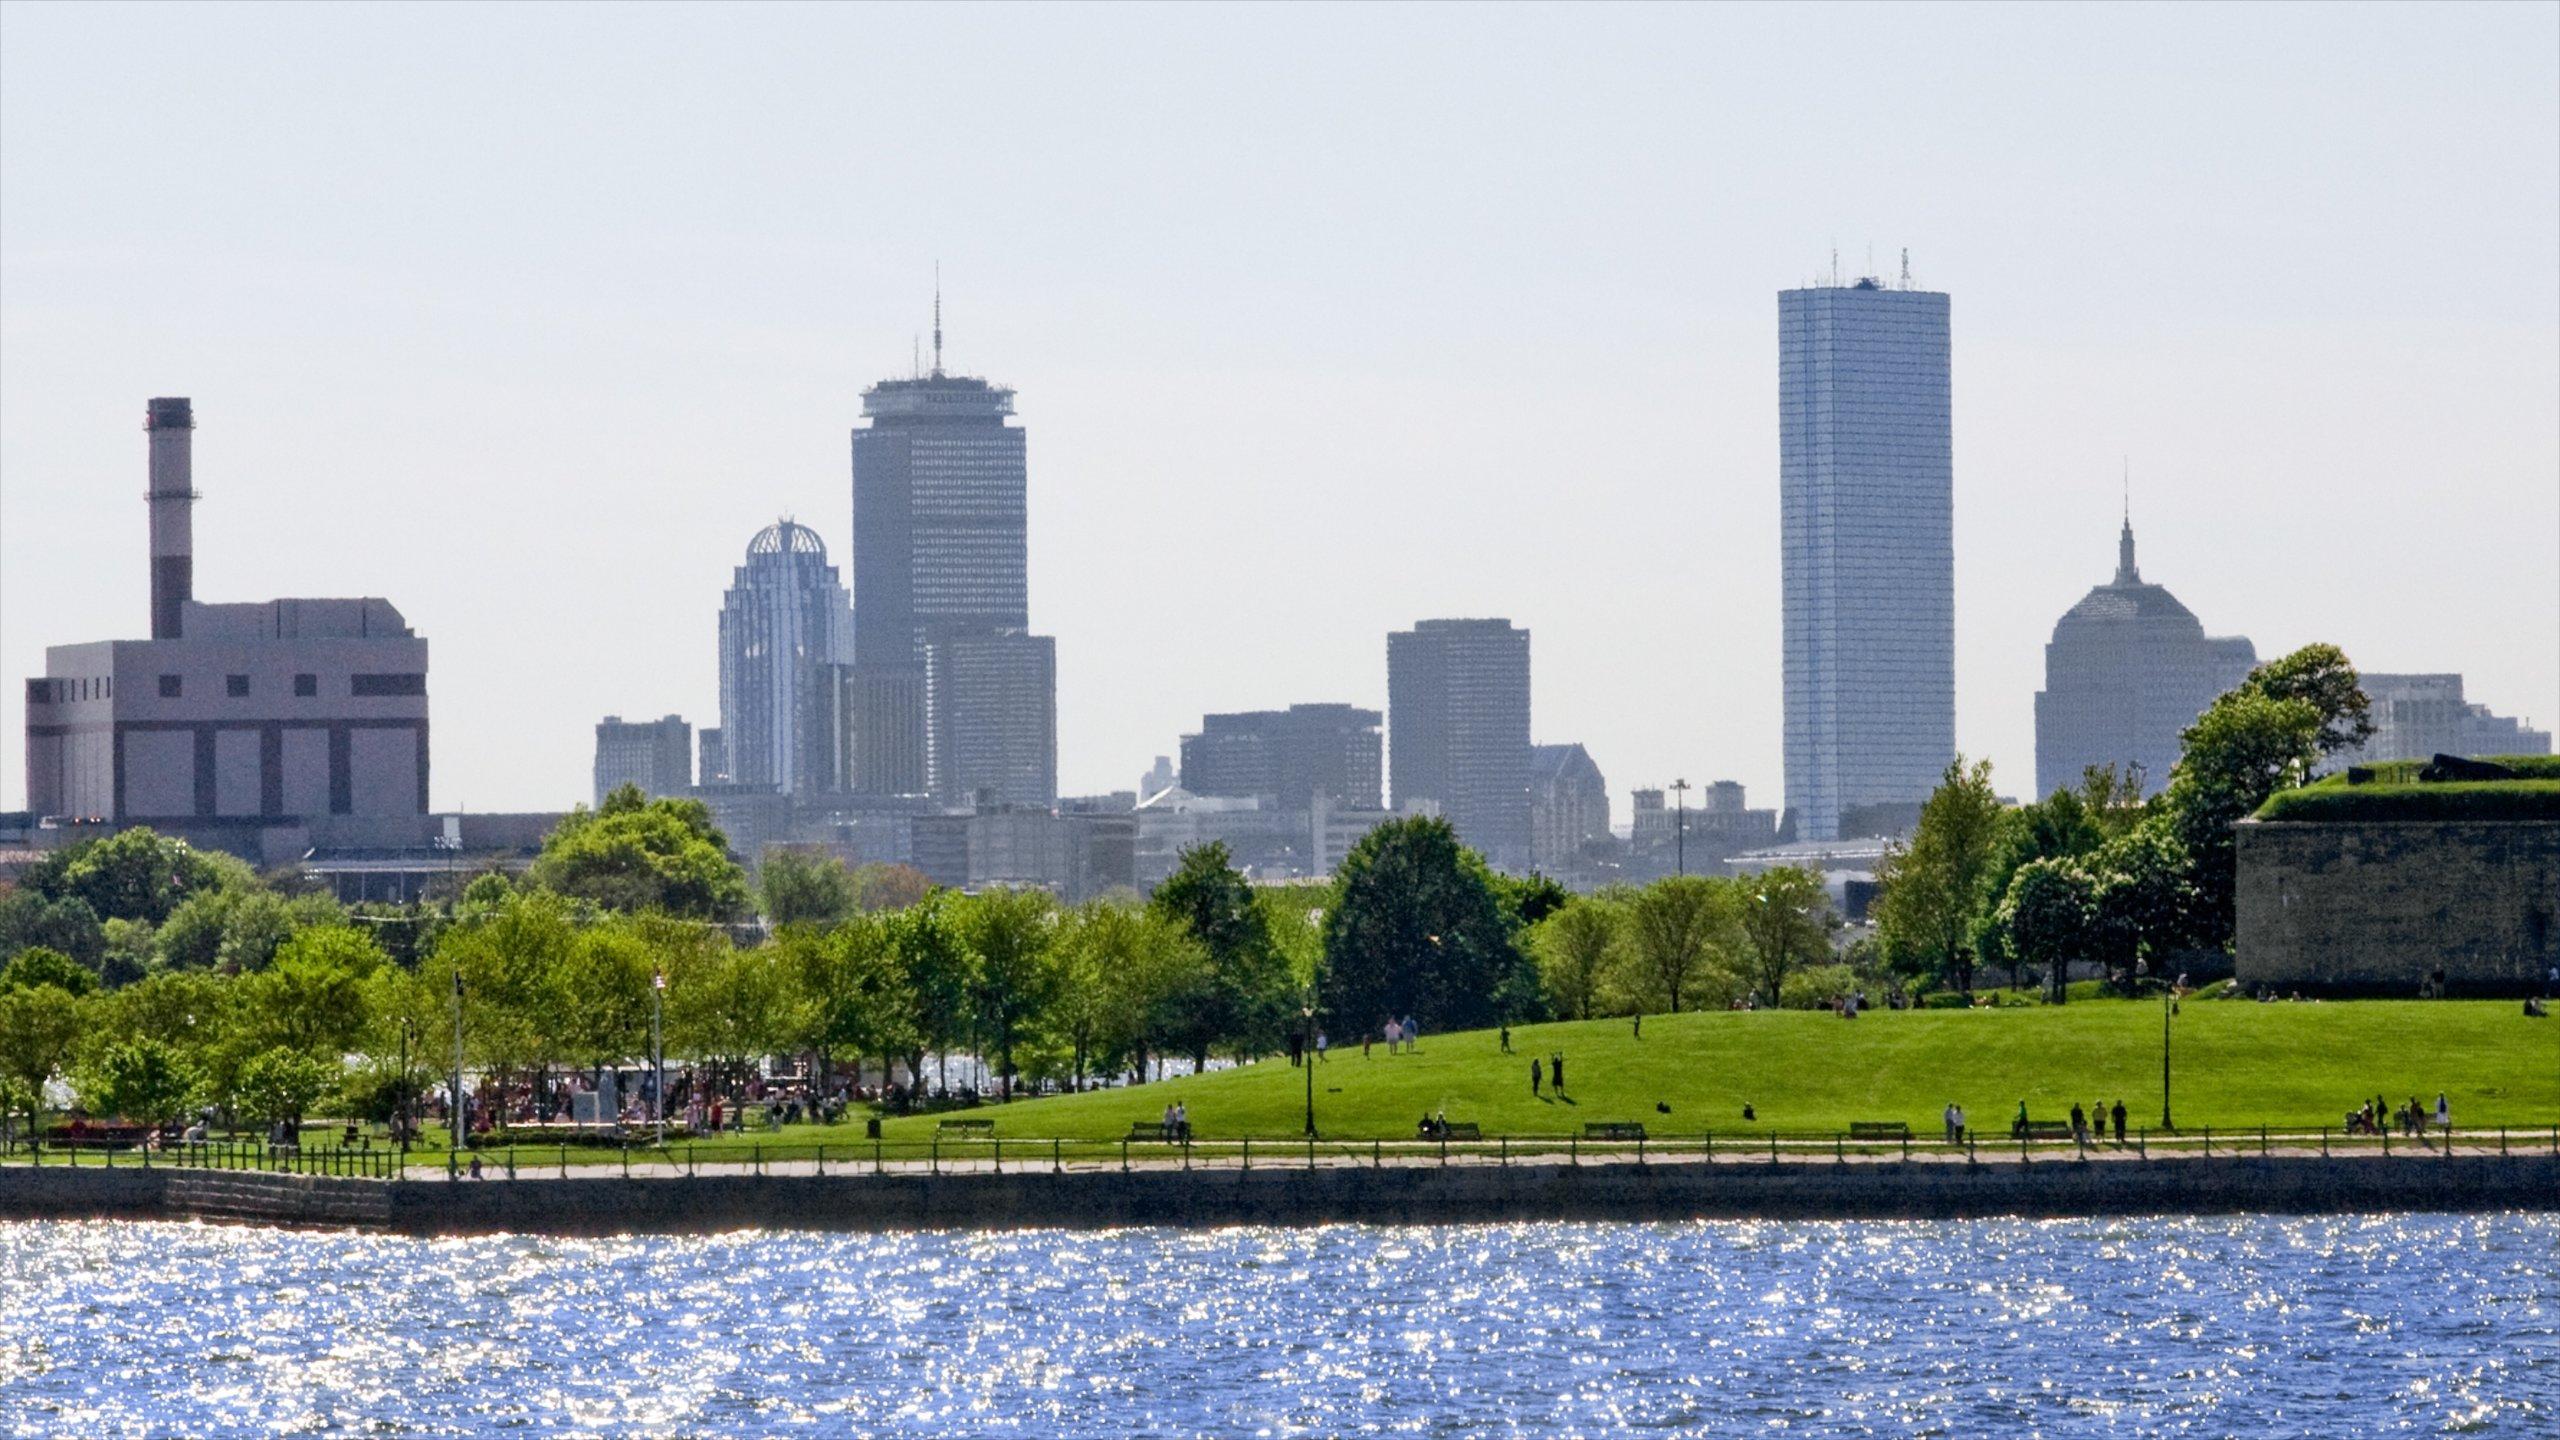 City Point, Boston, Massachusetts, United States of America